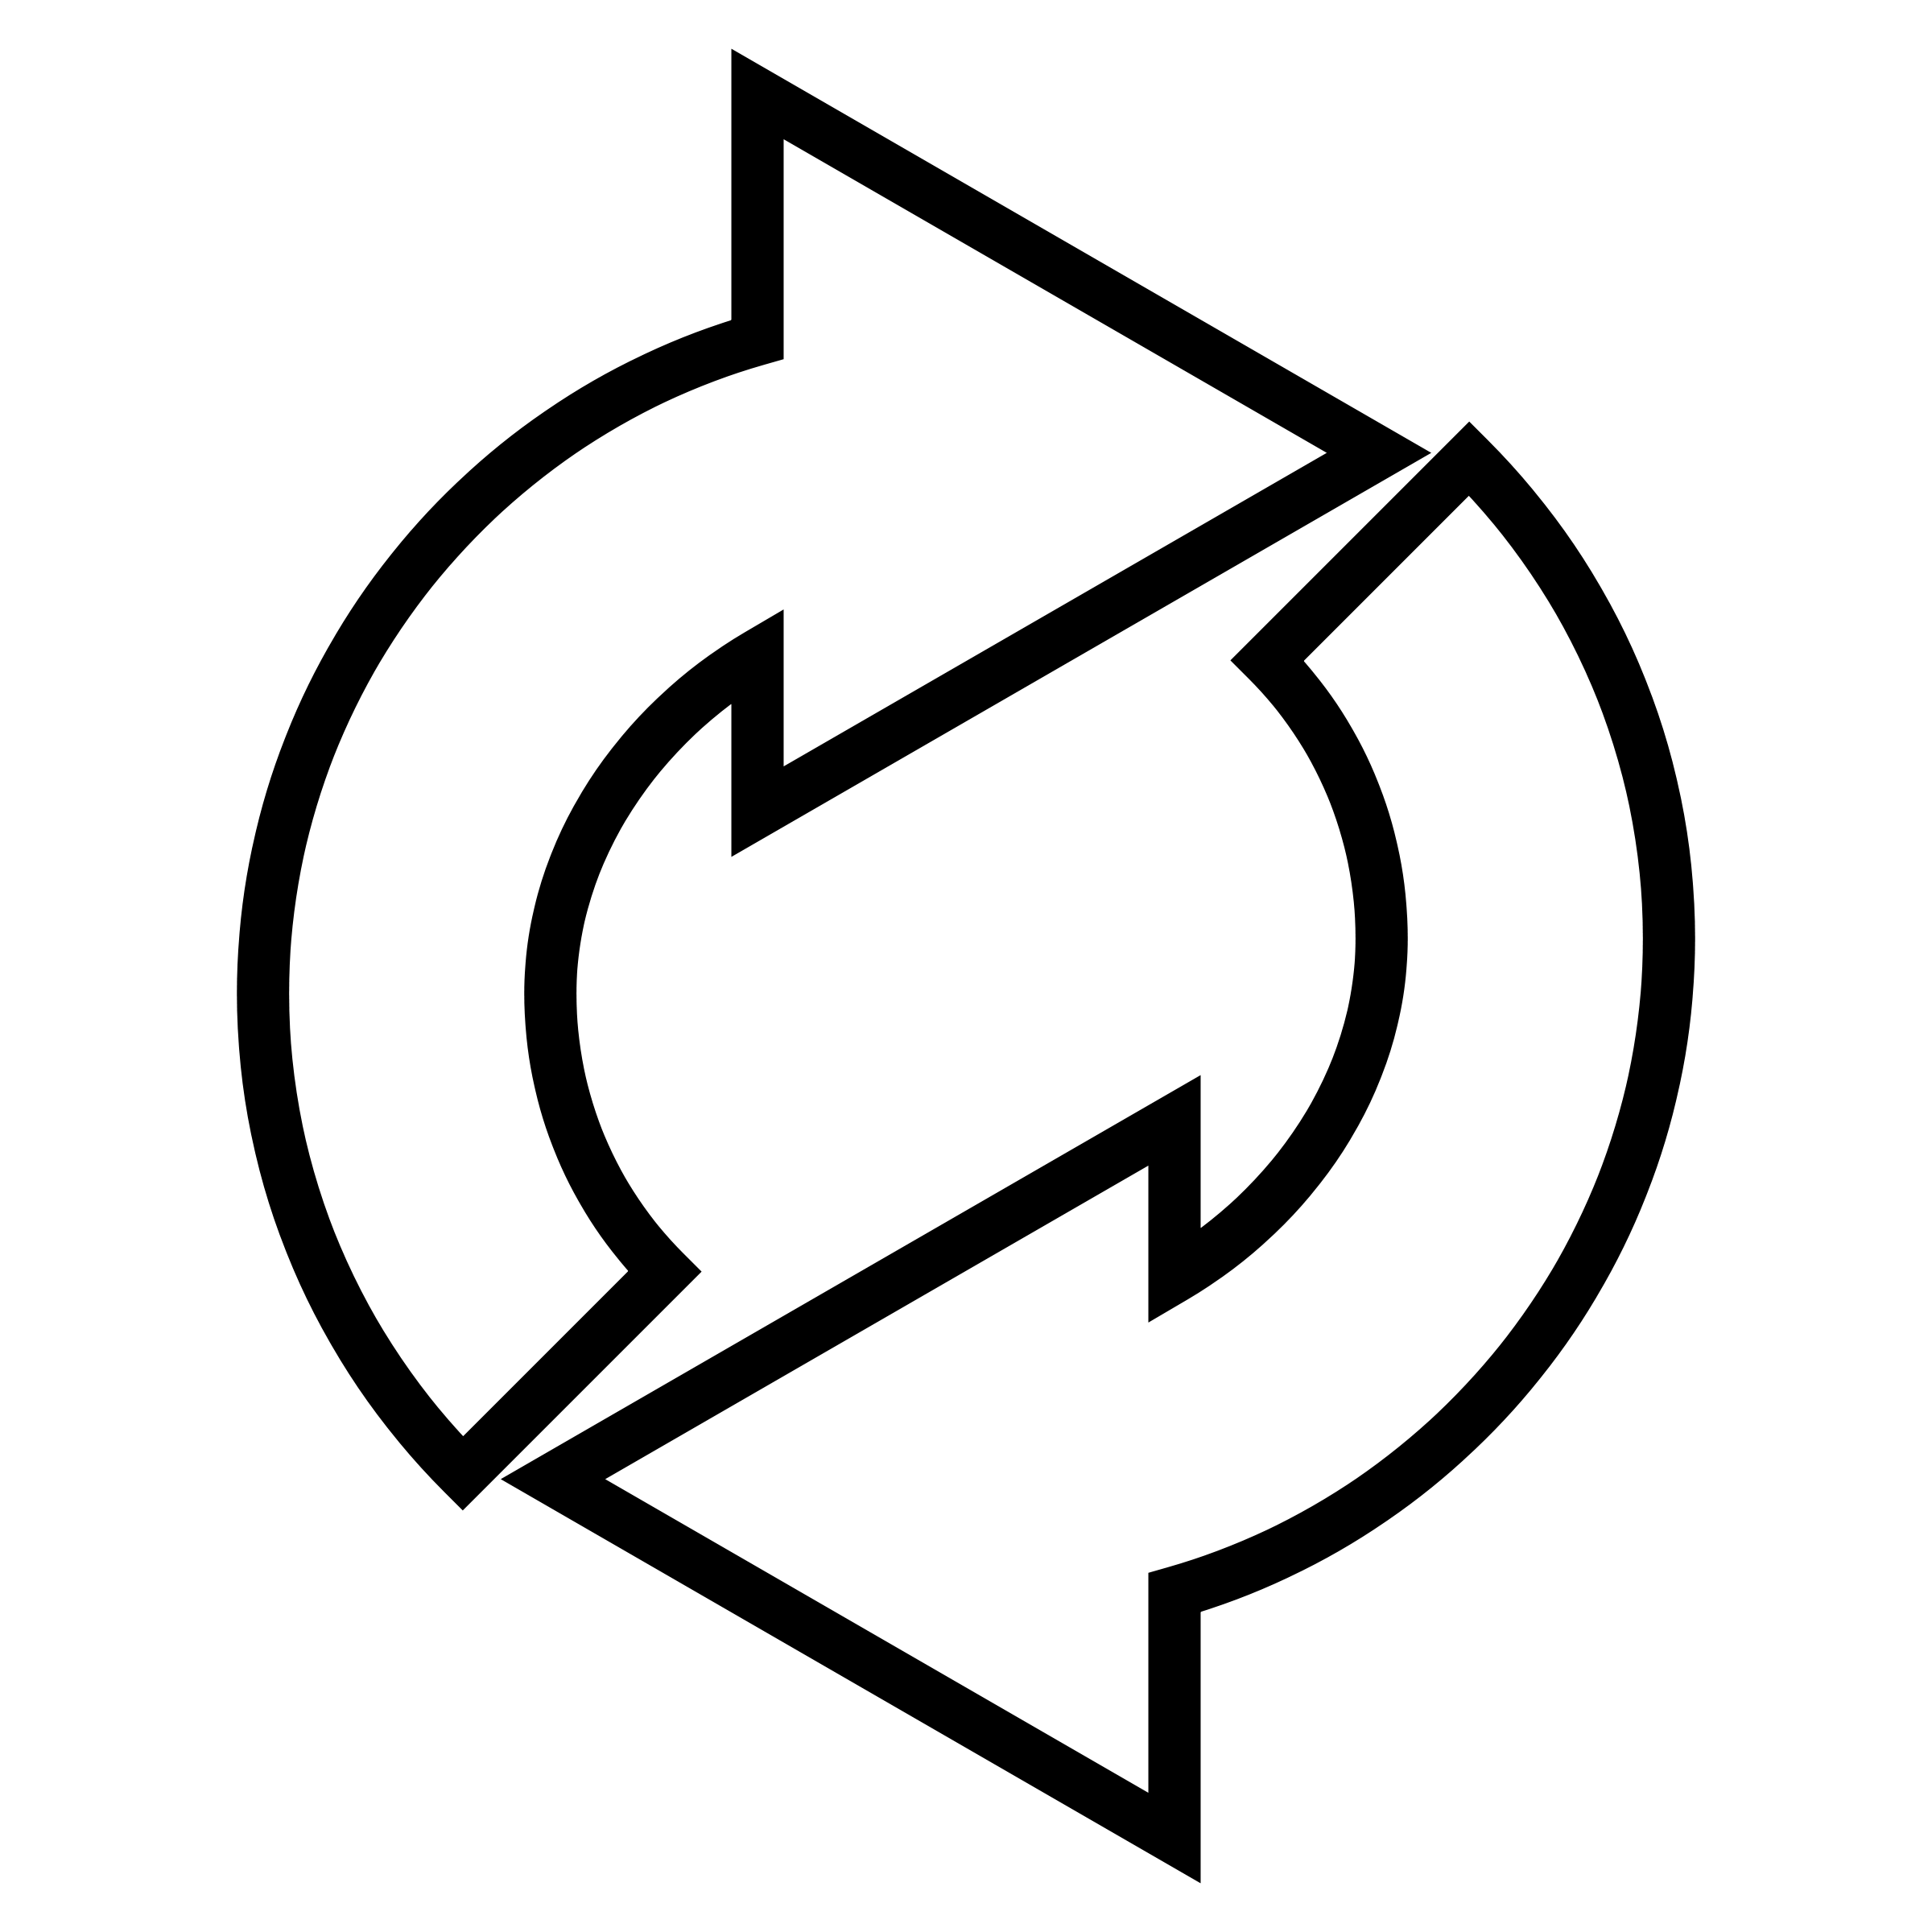 Loop Clipart.